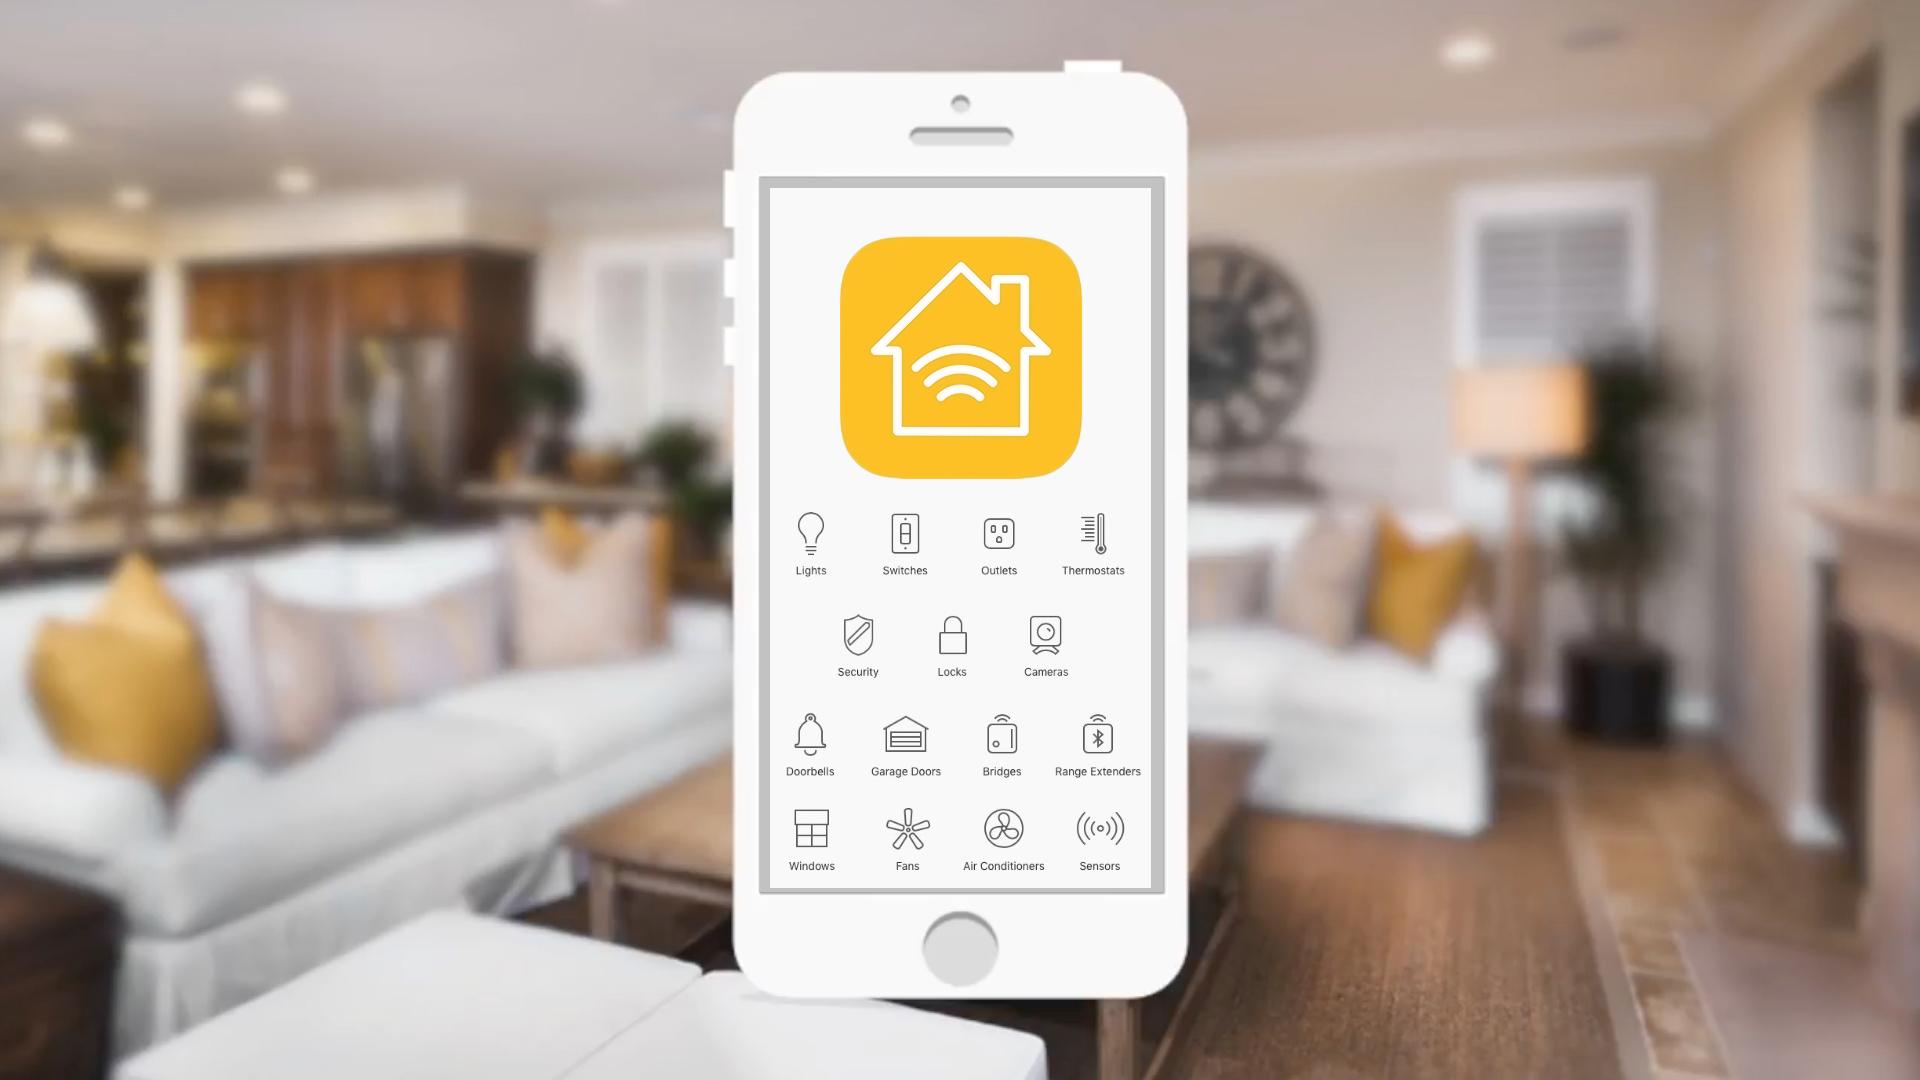 HomeKit device icons